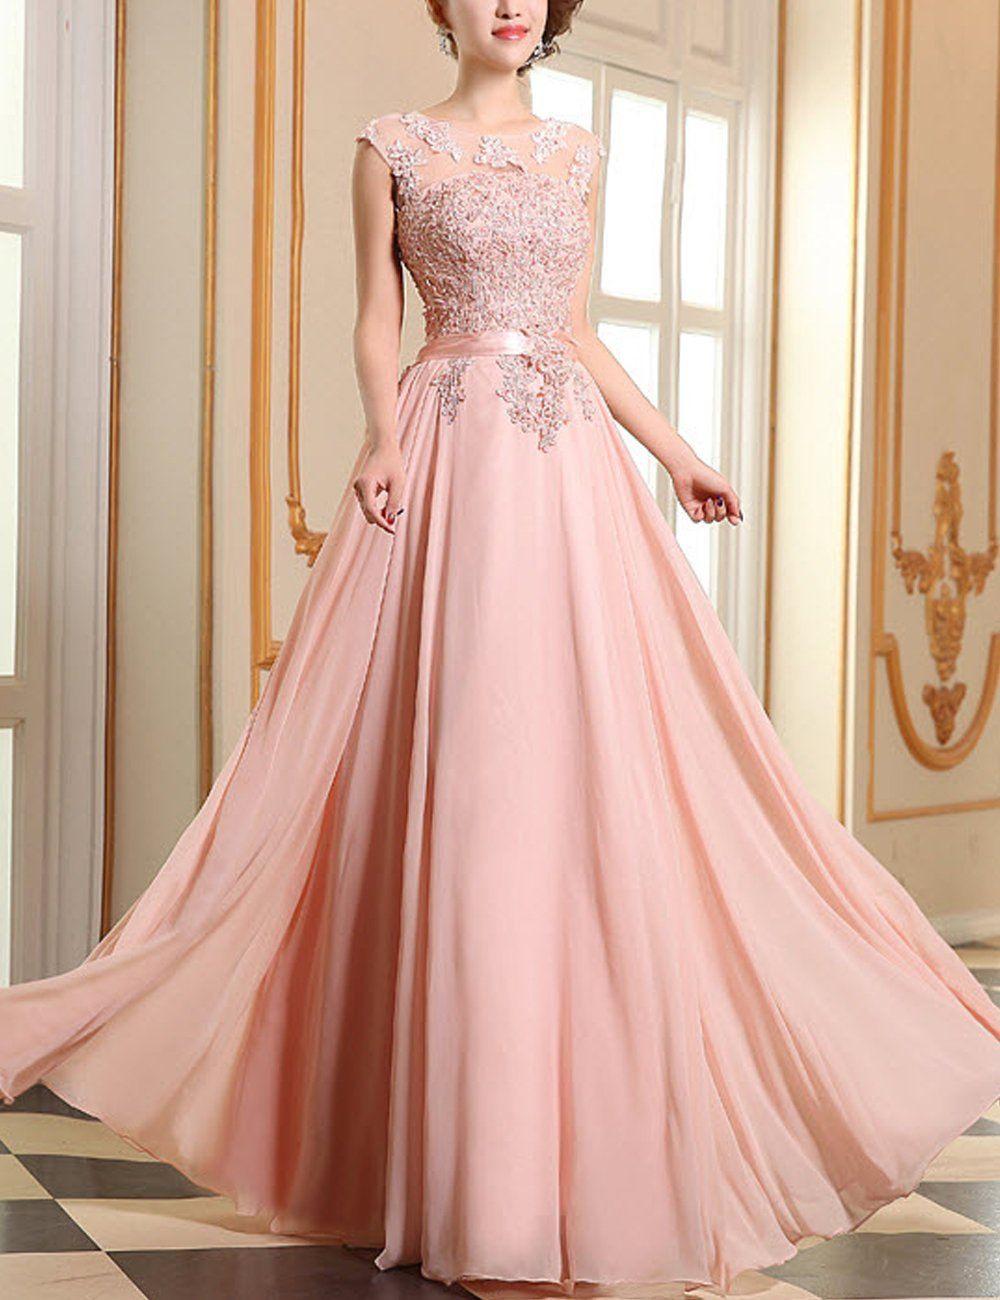 Formal Einfach Amazon Abend Kleid Boutique13 Genial Amazon Abend Kleid Stylish